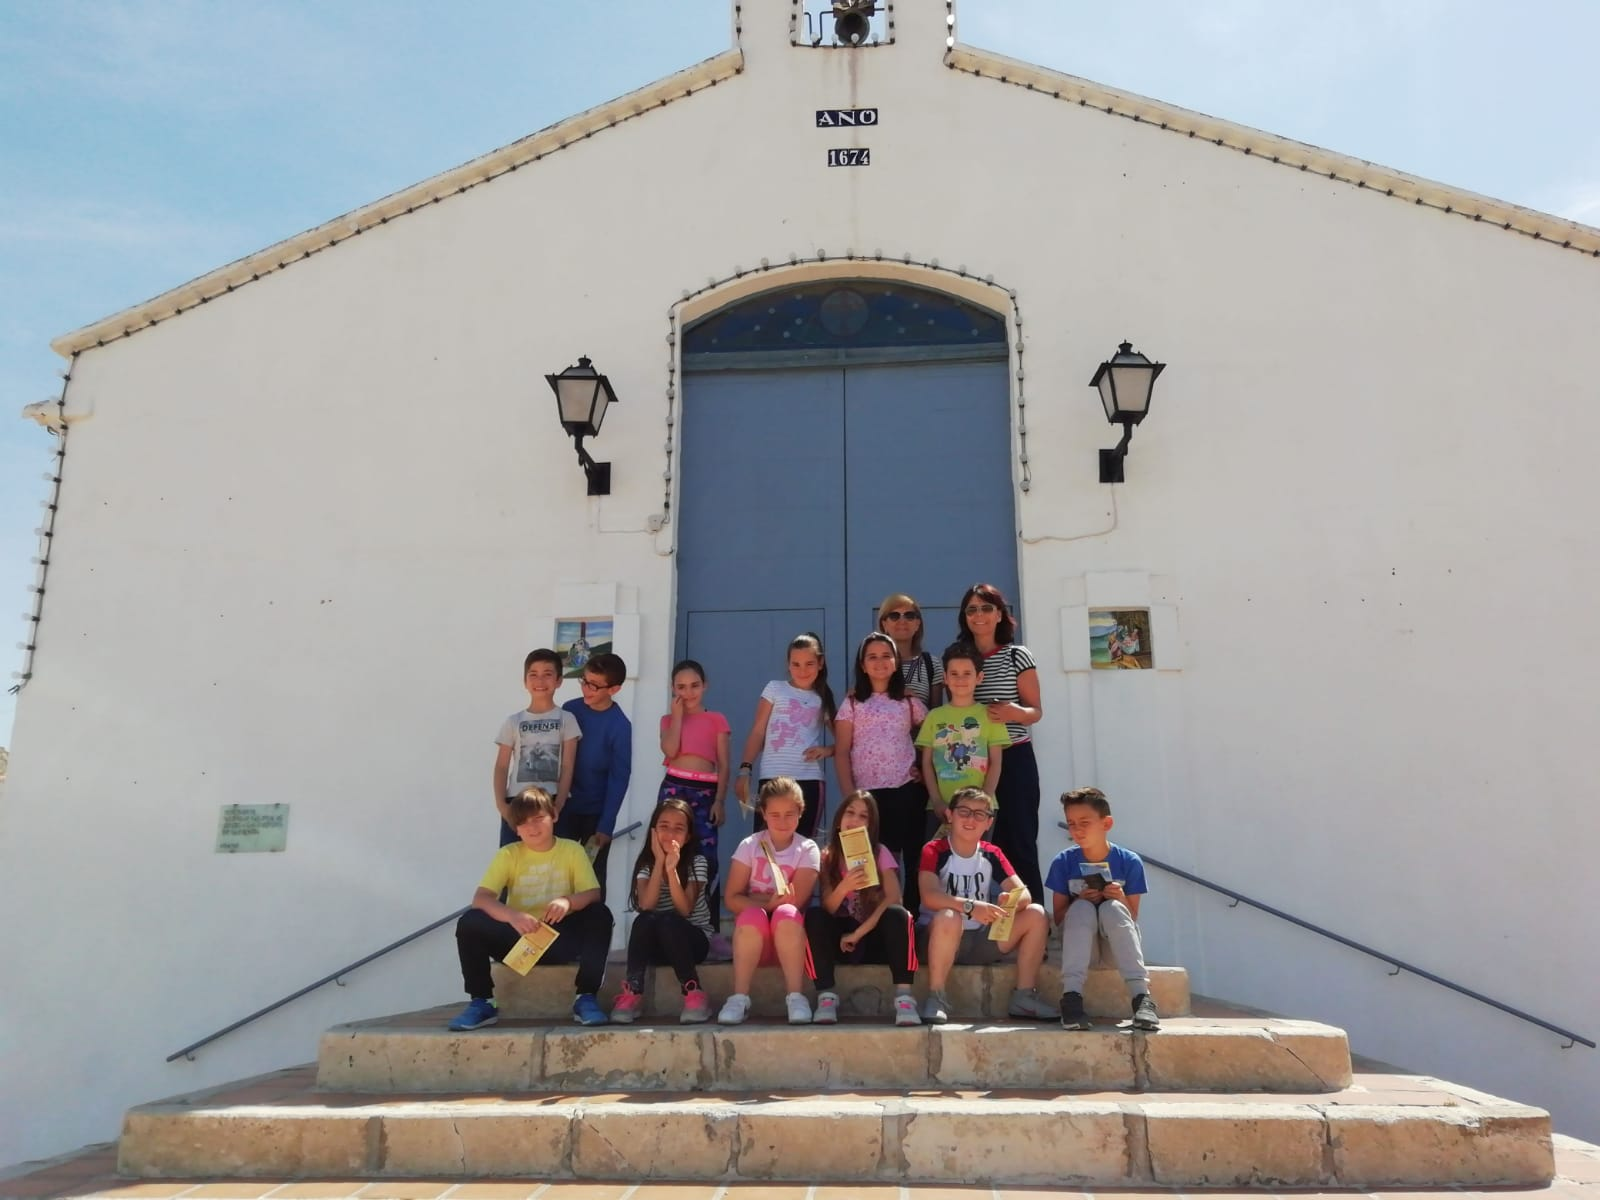 (2019-05-23) Visita ermita alumnos Laura - 3 C primaria - Reina Sofia - María Isabel Berenguer (11)